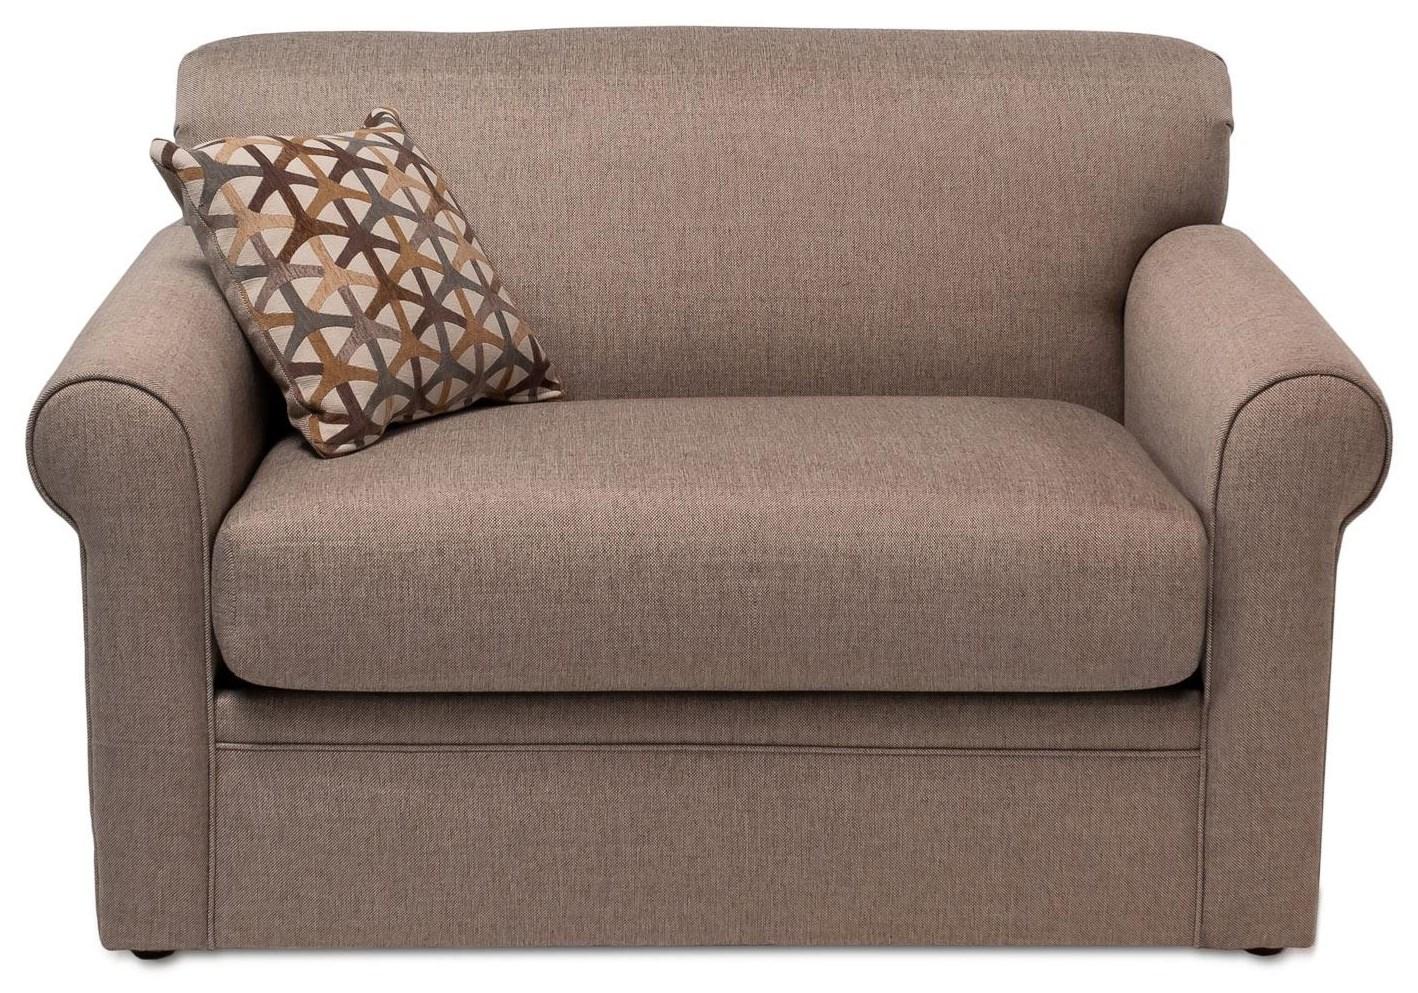 Overnight Sofa Grande Twin Sleep Sofa - Item Number: 2333-GRANDEWHEAT